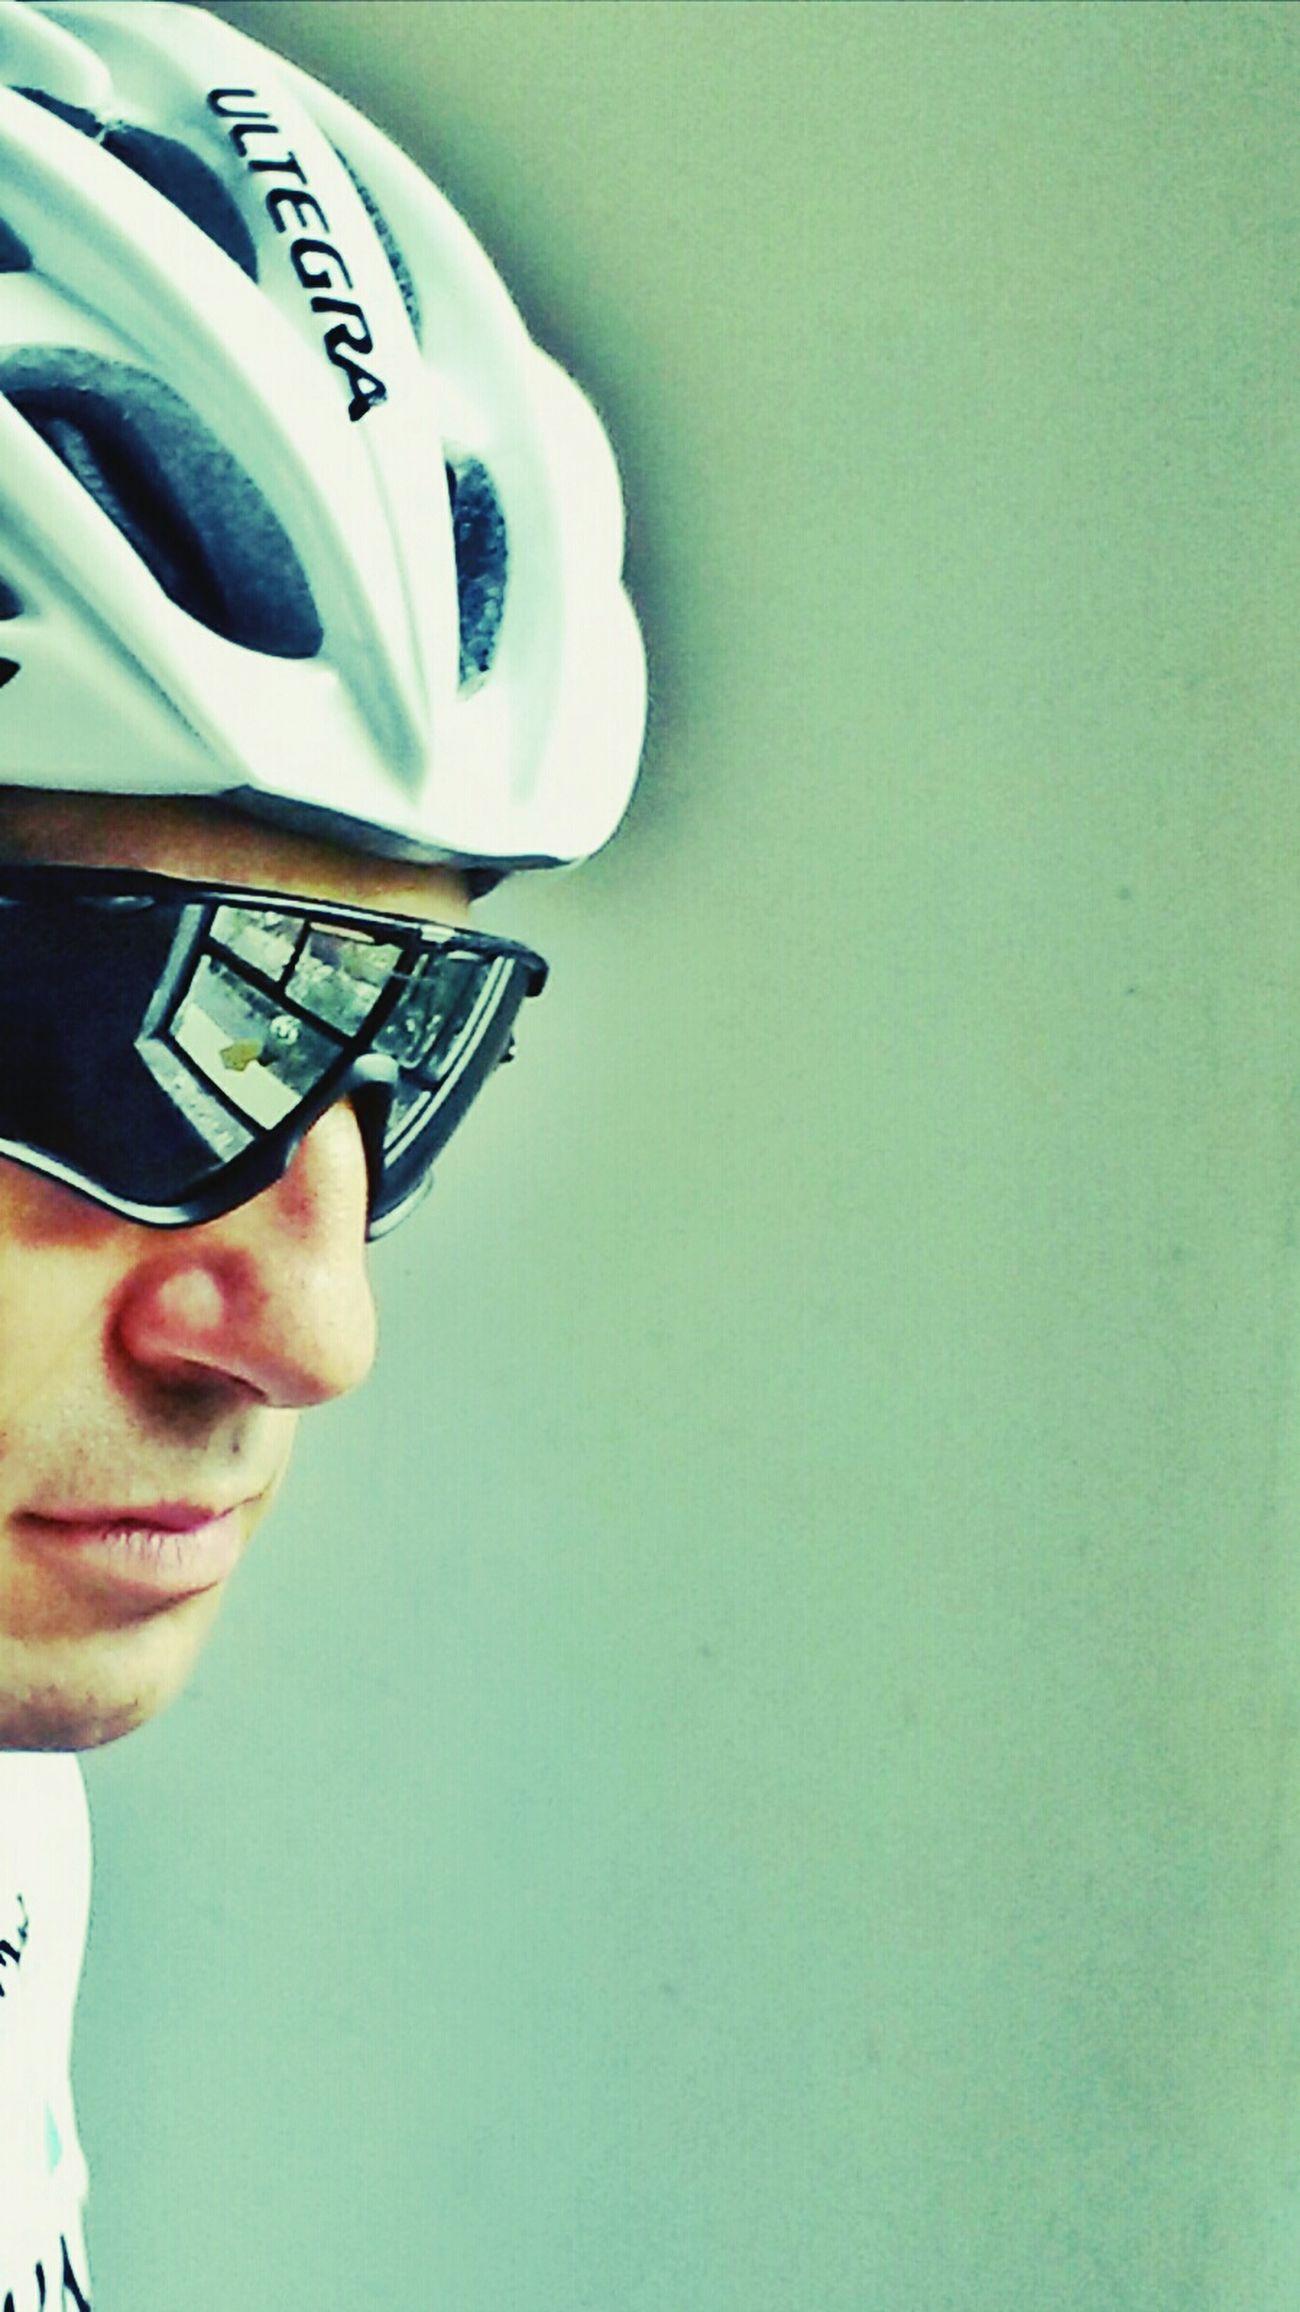 Cycling Oakleysunglasses Obssesions Selfshot Fashion Hello World Taking Photos